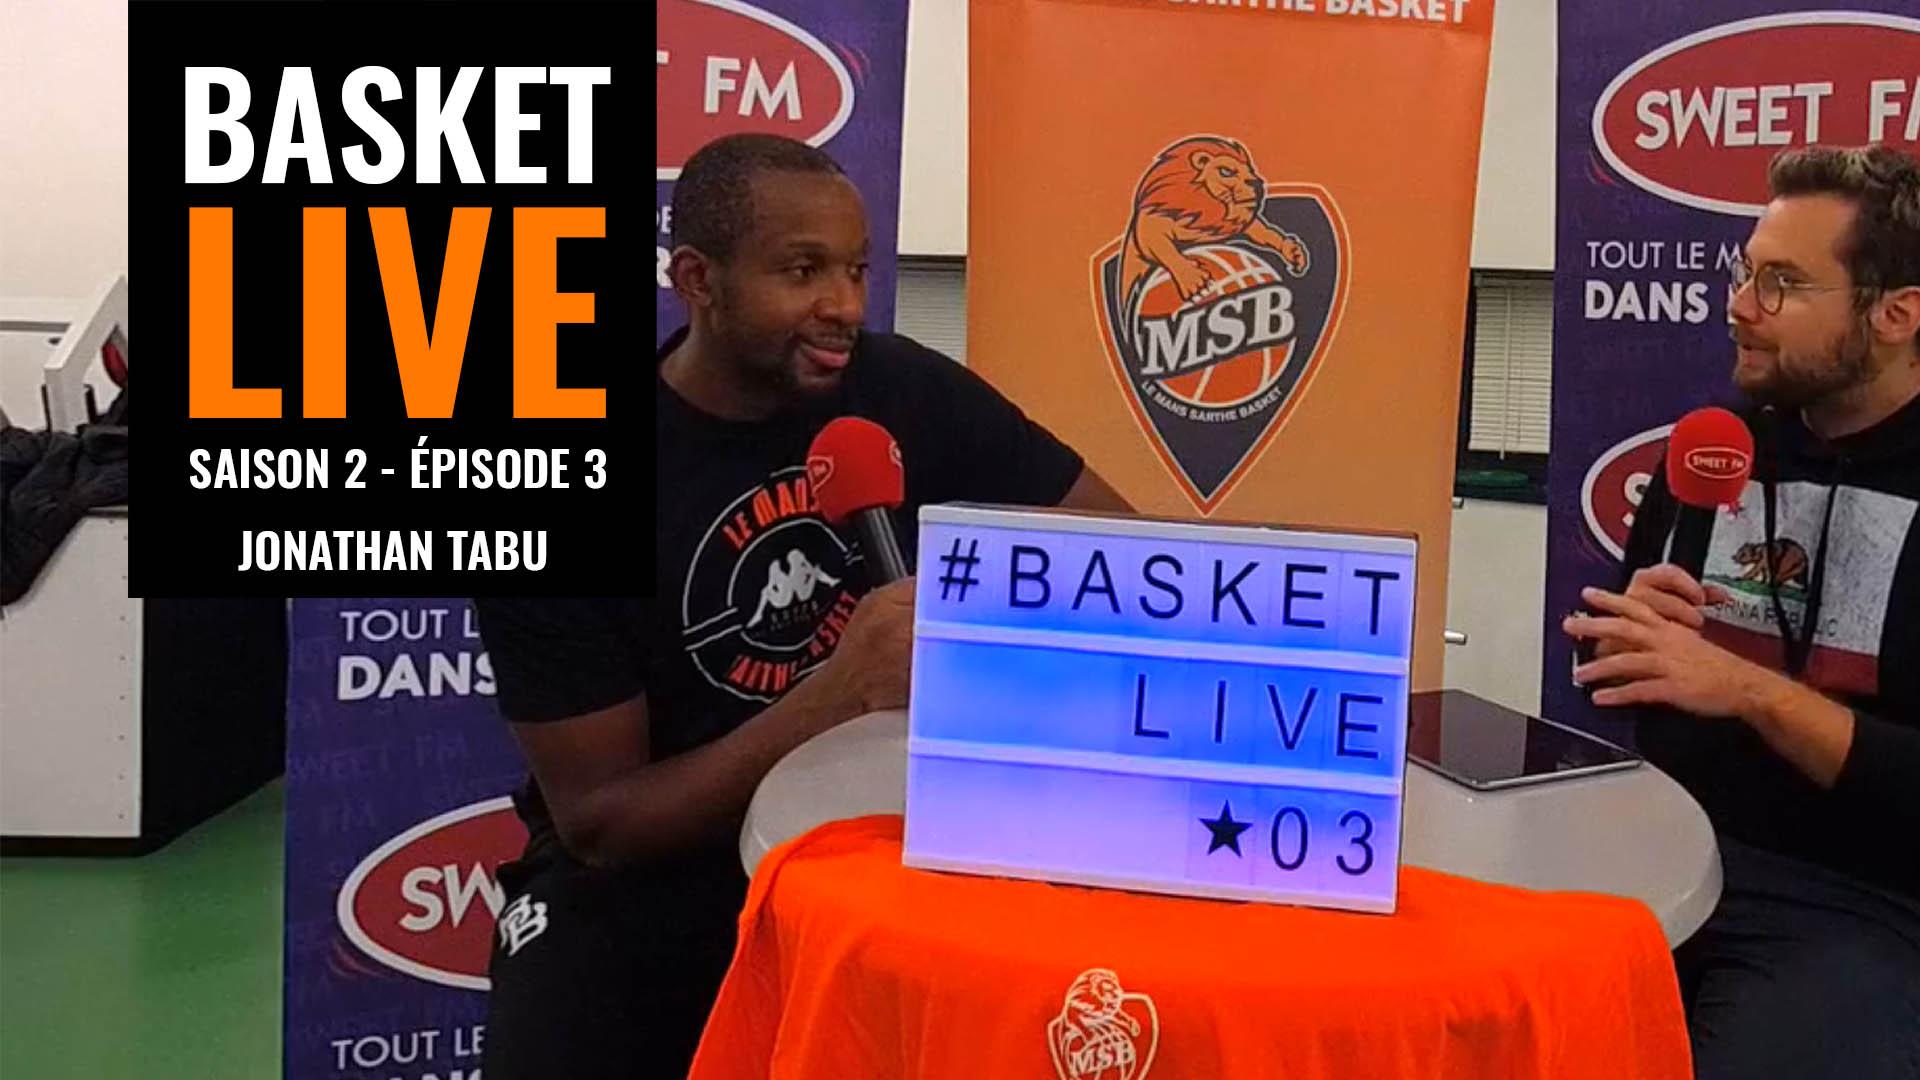 Basket Live Saison 2 / Épisode 3 - Jonathan Tabu